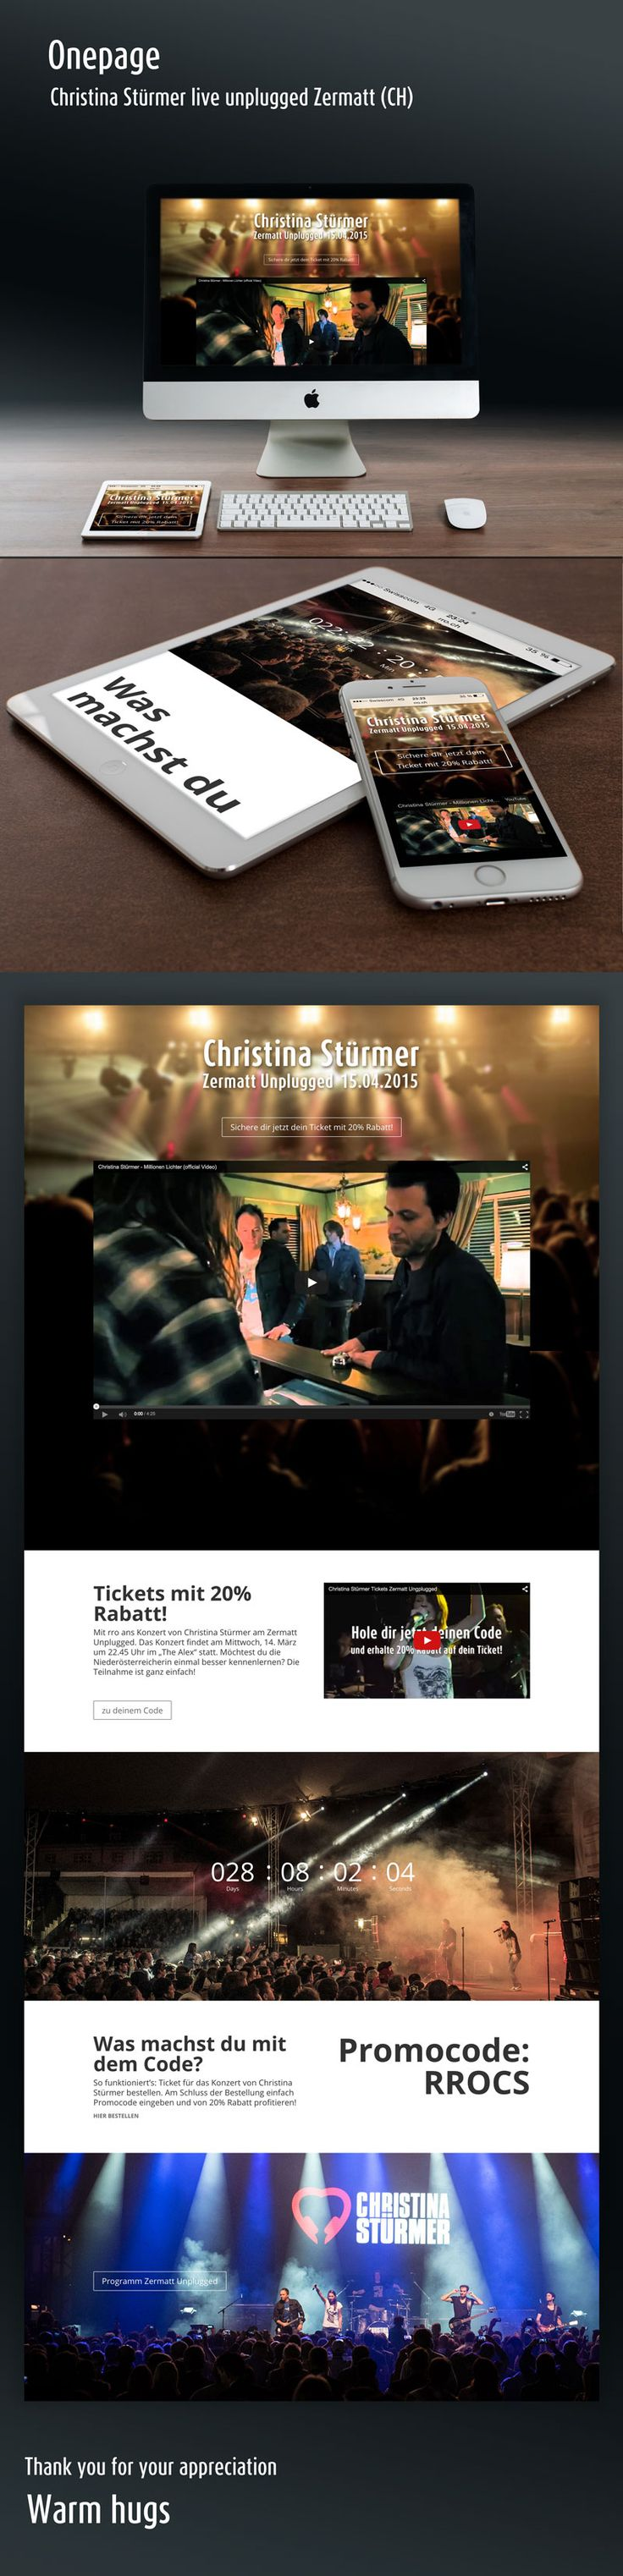 #onepage #zermatt #unplugged #christina stümer